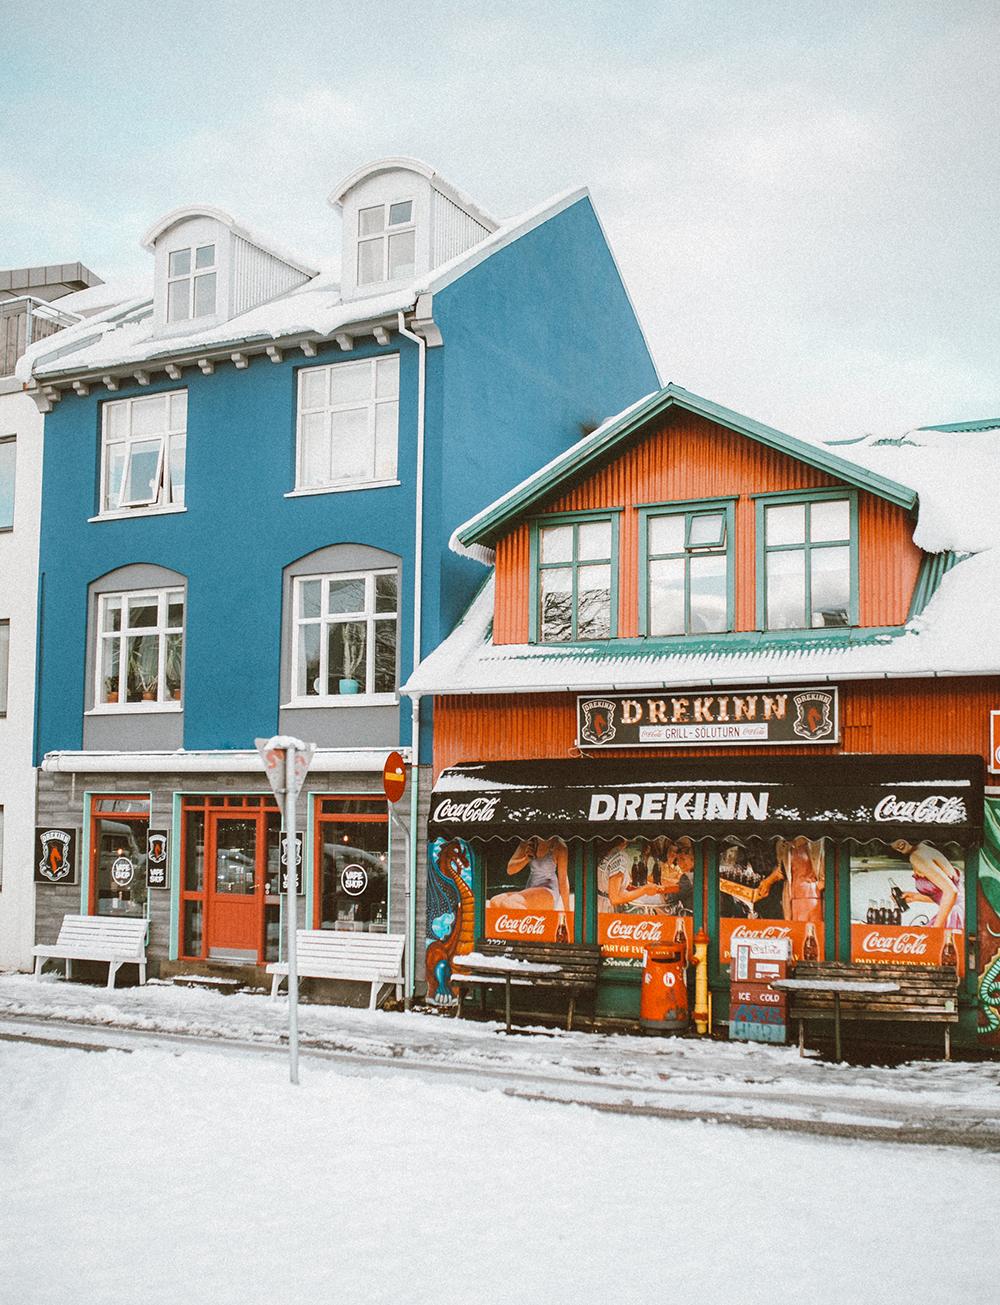 livvyland-blog-olivia-watson-travel-lifestyle-blogger-iceland-road-trip-what-to-do-pack-reykjavik-noken-travel-guide-5